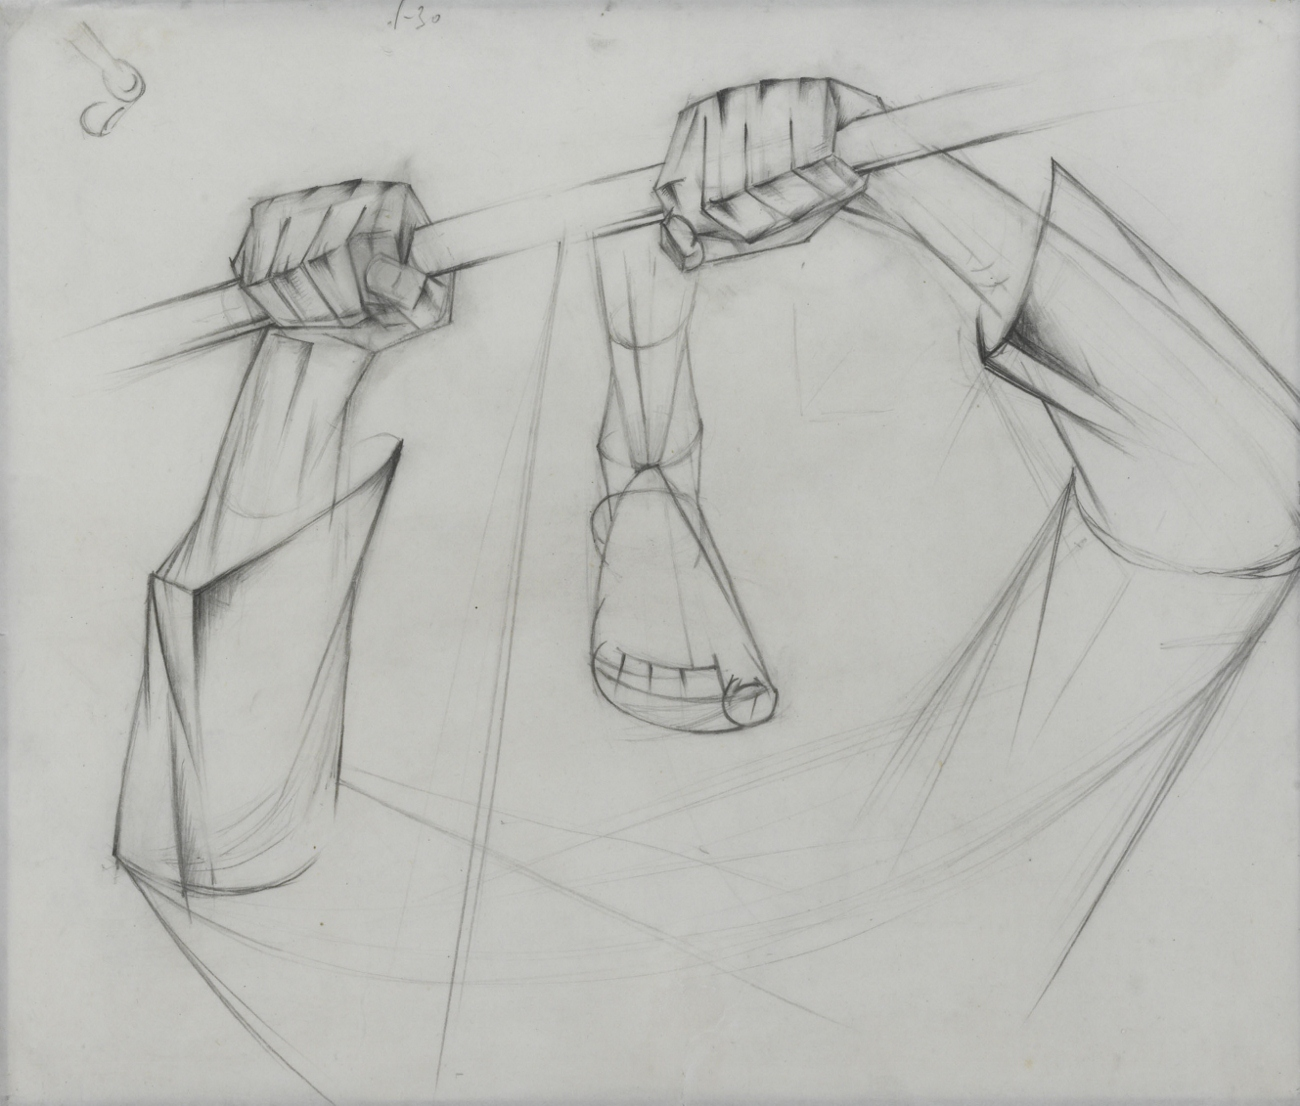 Hands Gripping a Saw, 1928-9 - Alexander Bogomazov